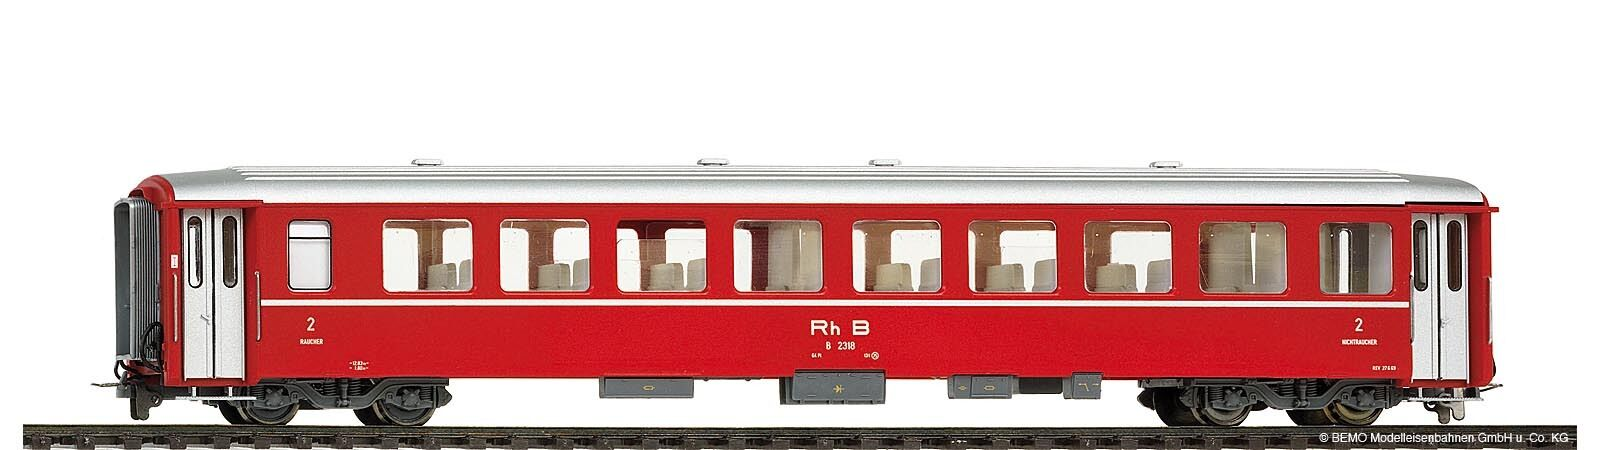 BEMO 3253118 vagoni B 2318 unità carro i RHB h0m